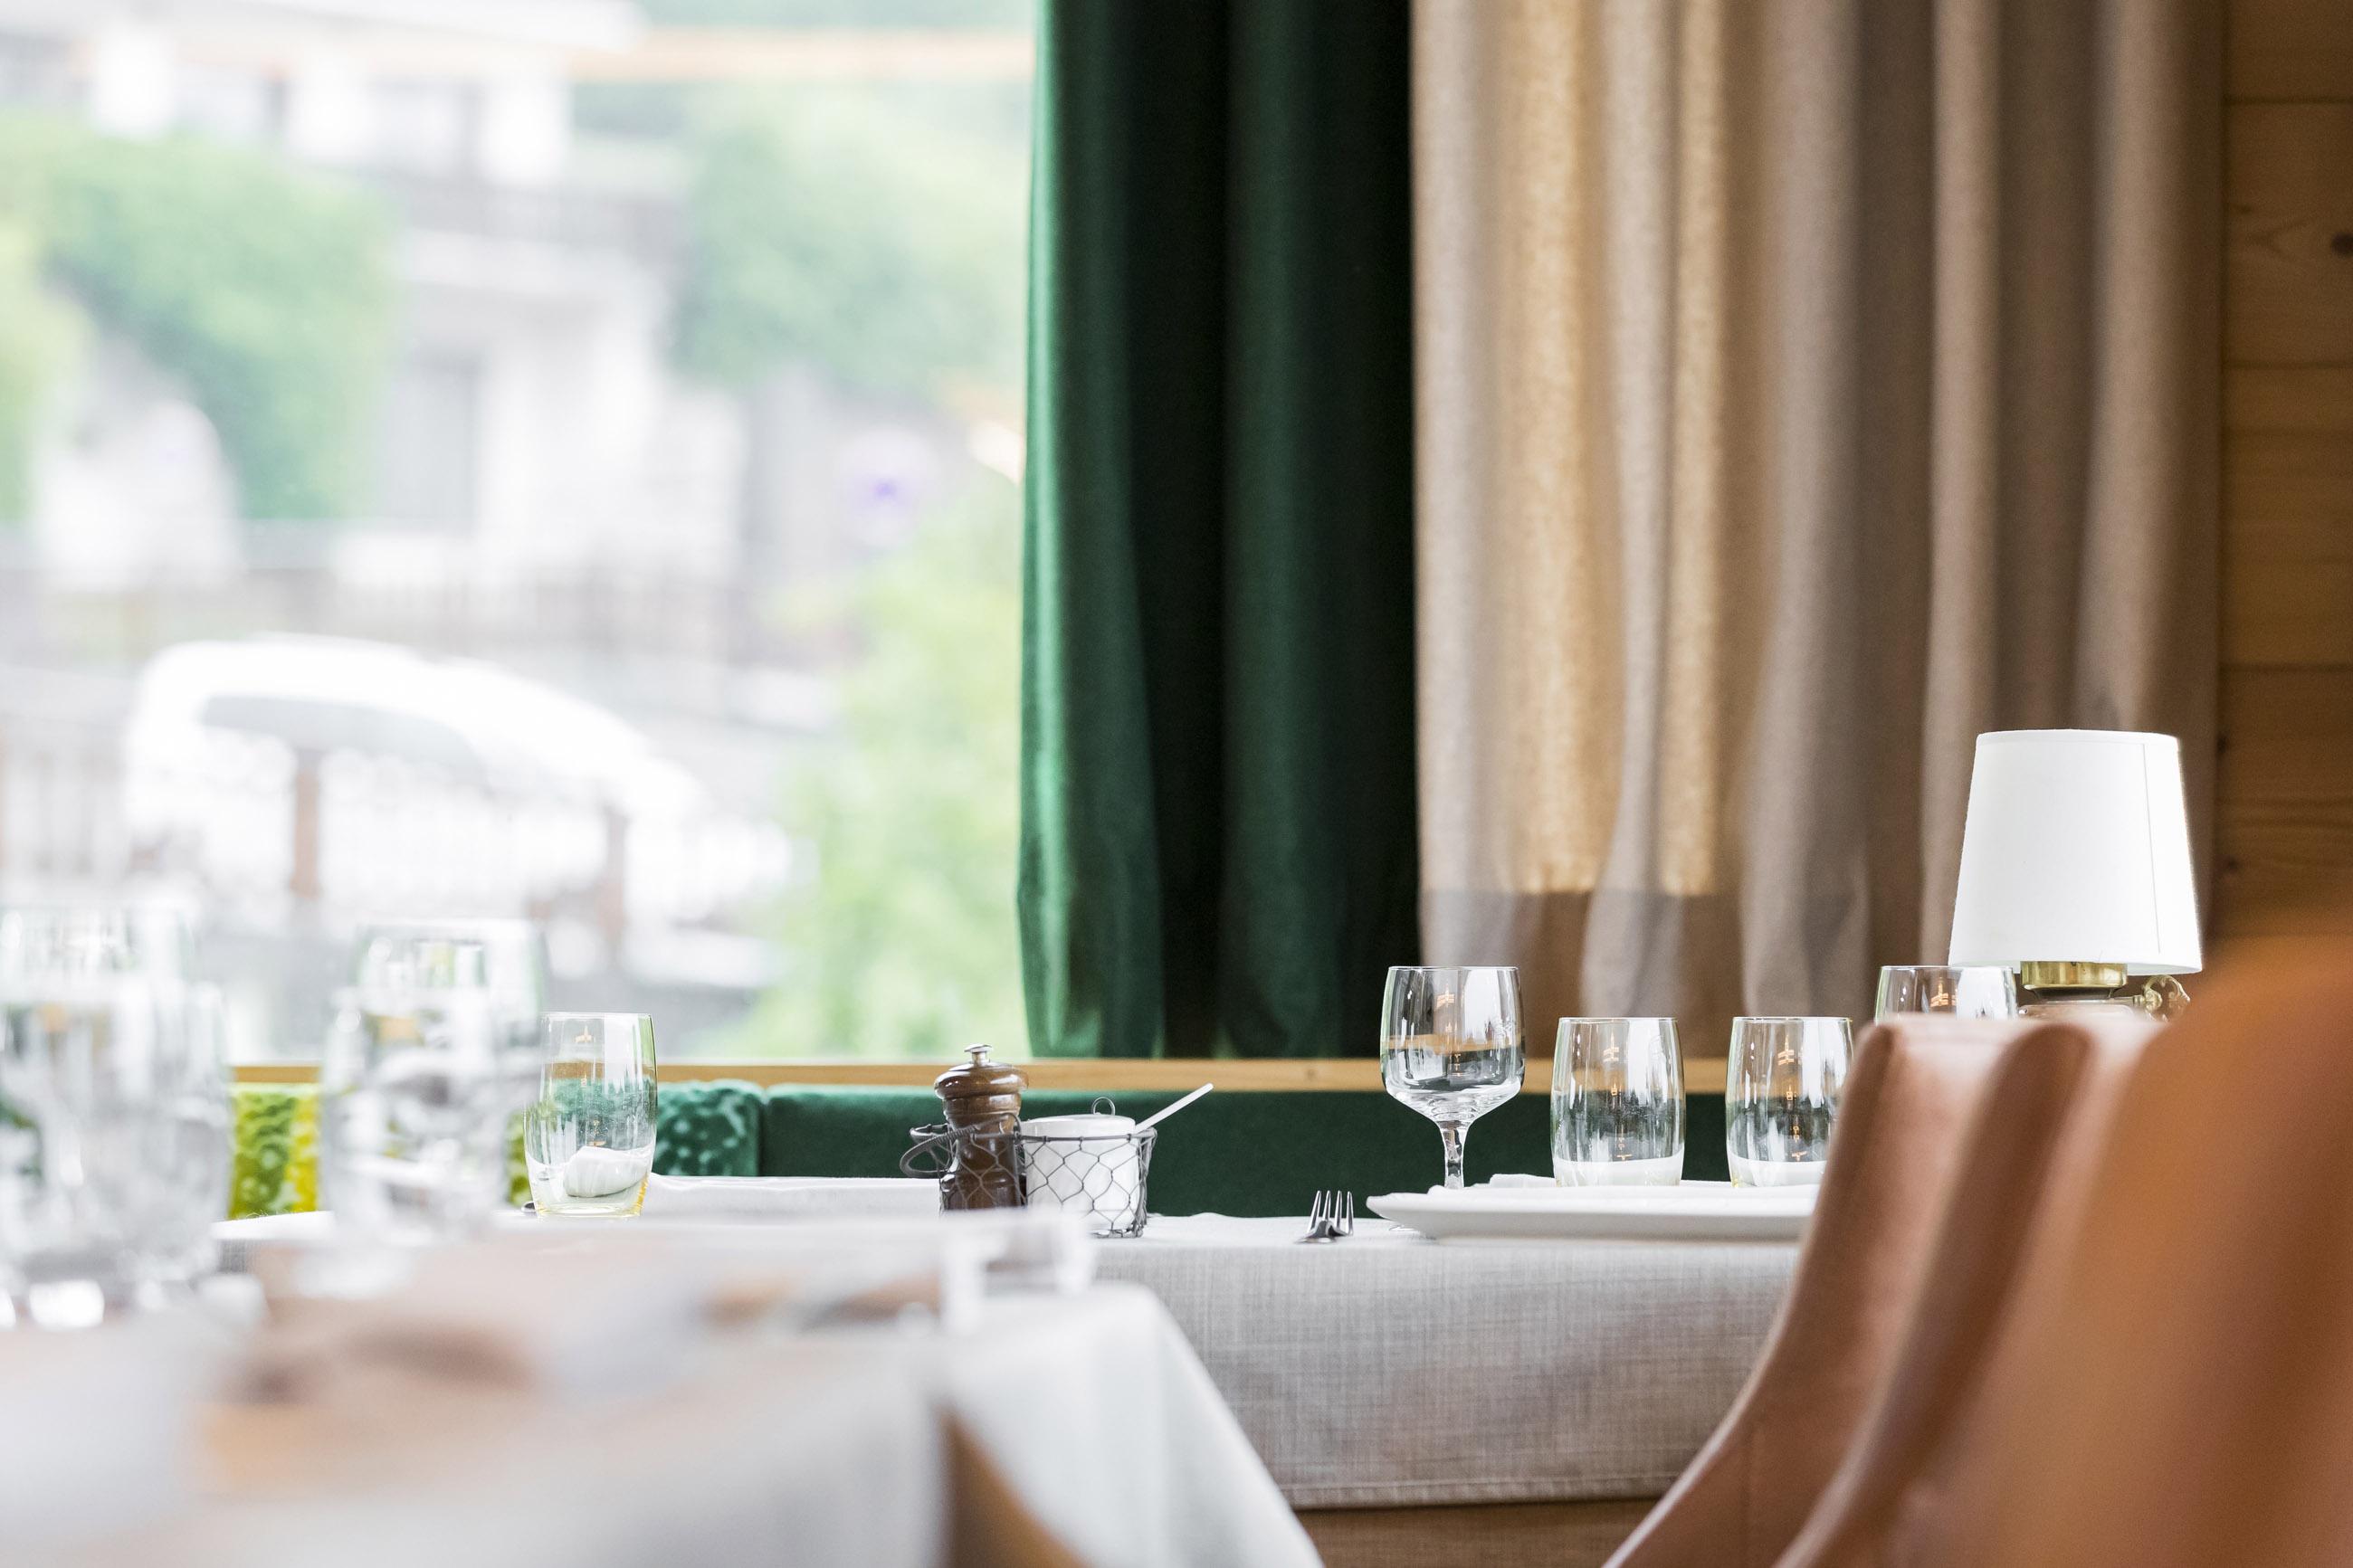 Restaurant Le Cordonant2